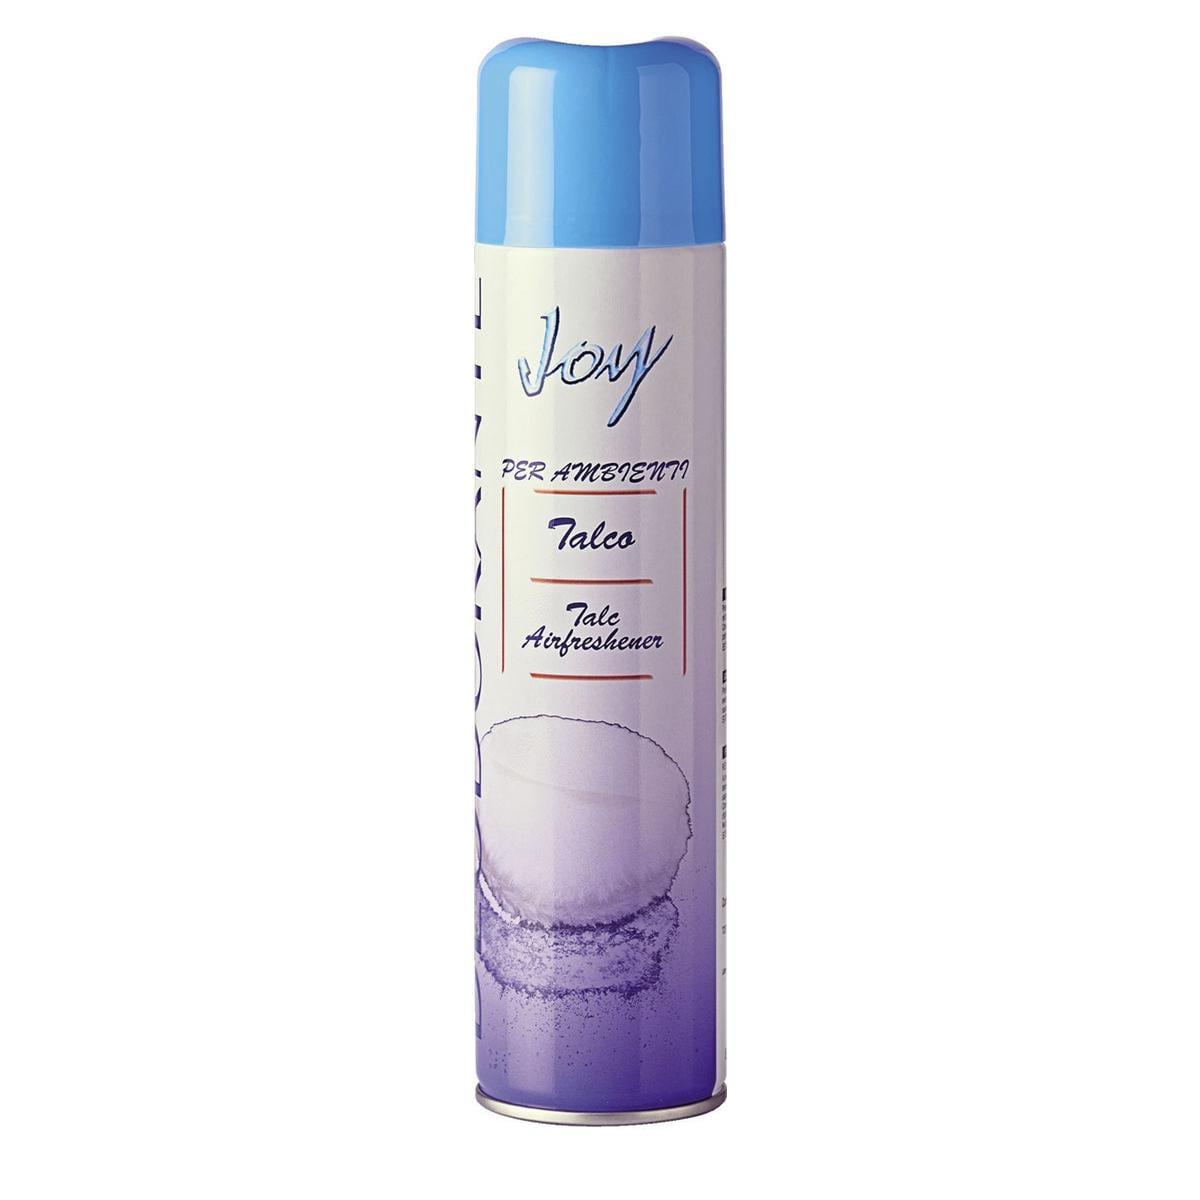 Deodoranti Per Ambienti.Deodoranti Per Ambienti Profumo Talco